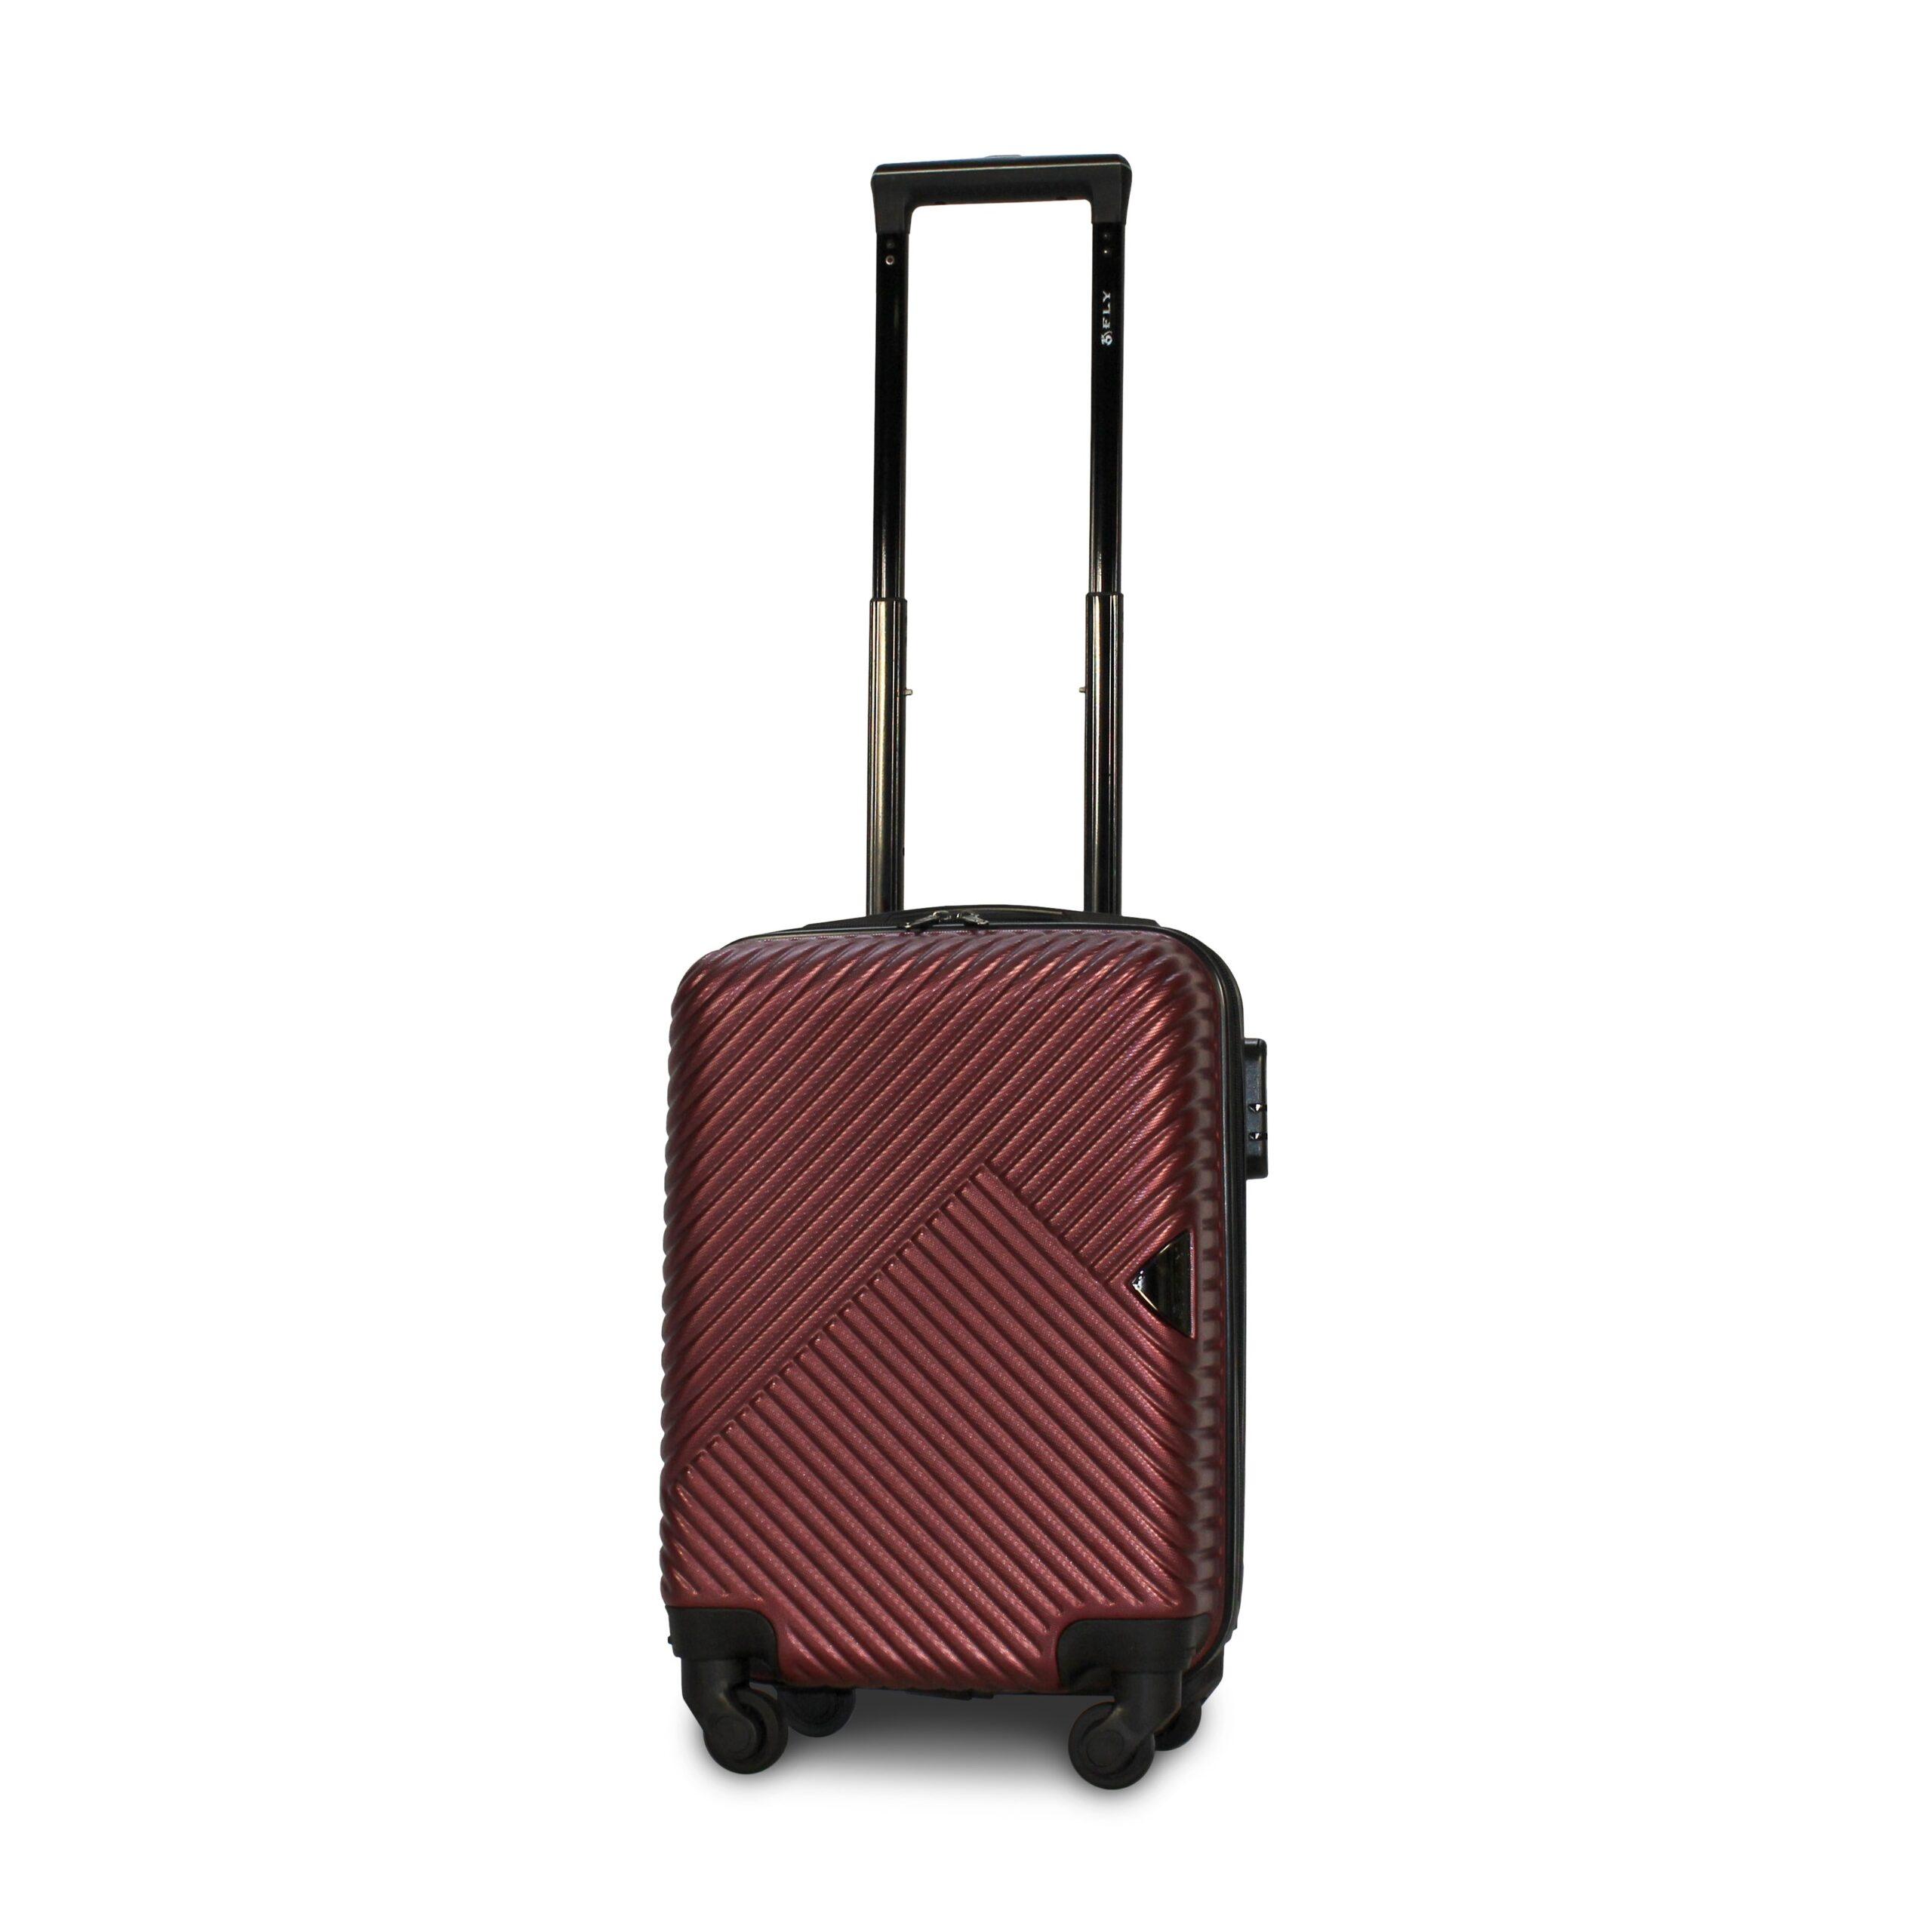 Мини чемодан (XS) Fly 2702 | пластиковый